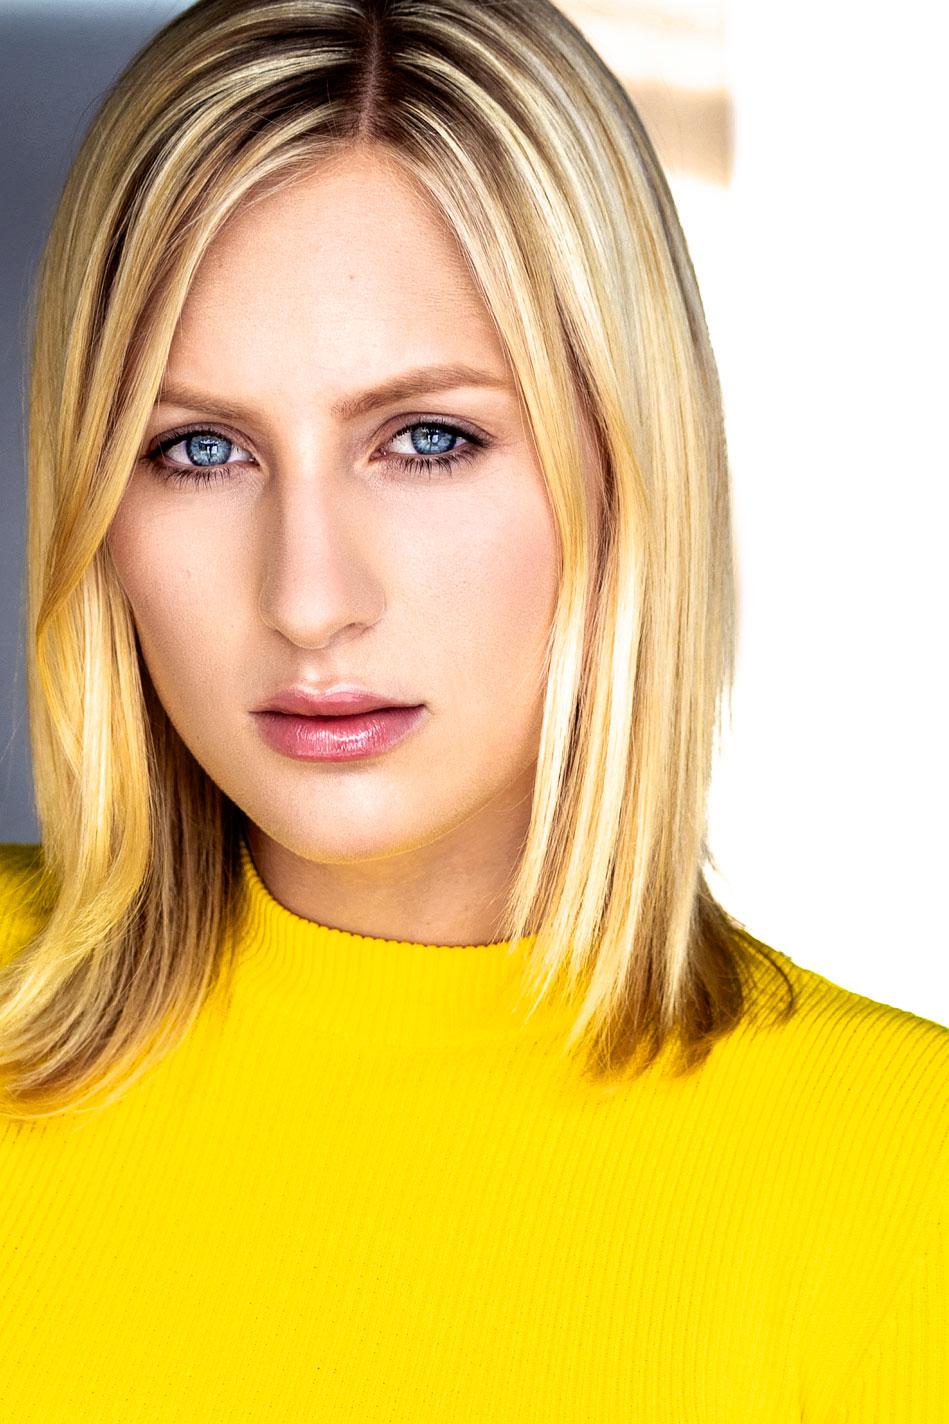 yellow-girl.jpg